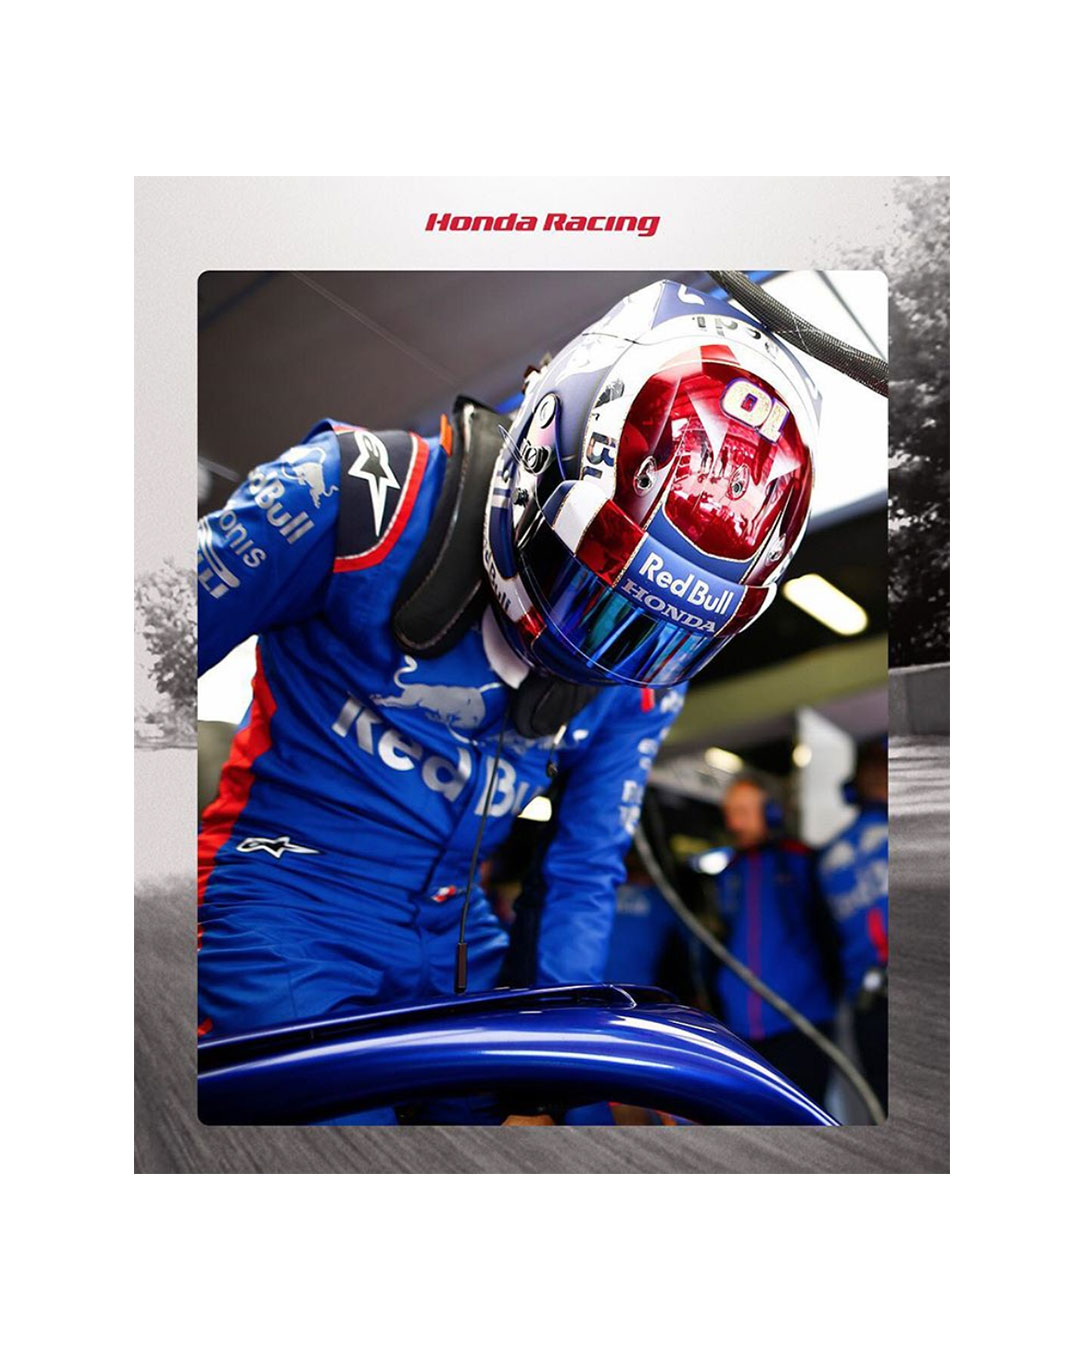 ary-and-joe-honda-formula-1-poster-4.jpg